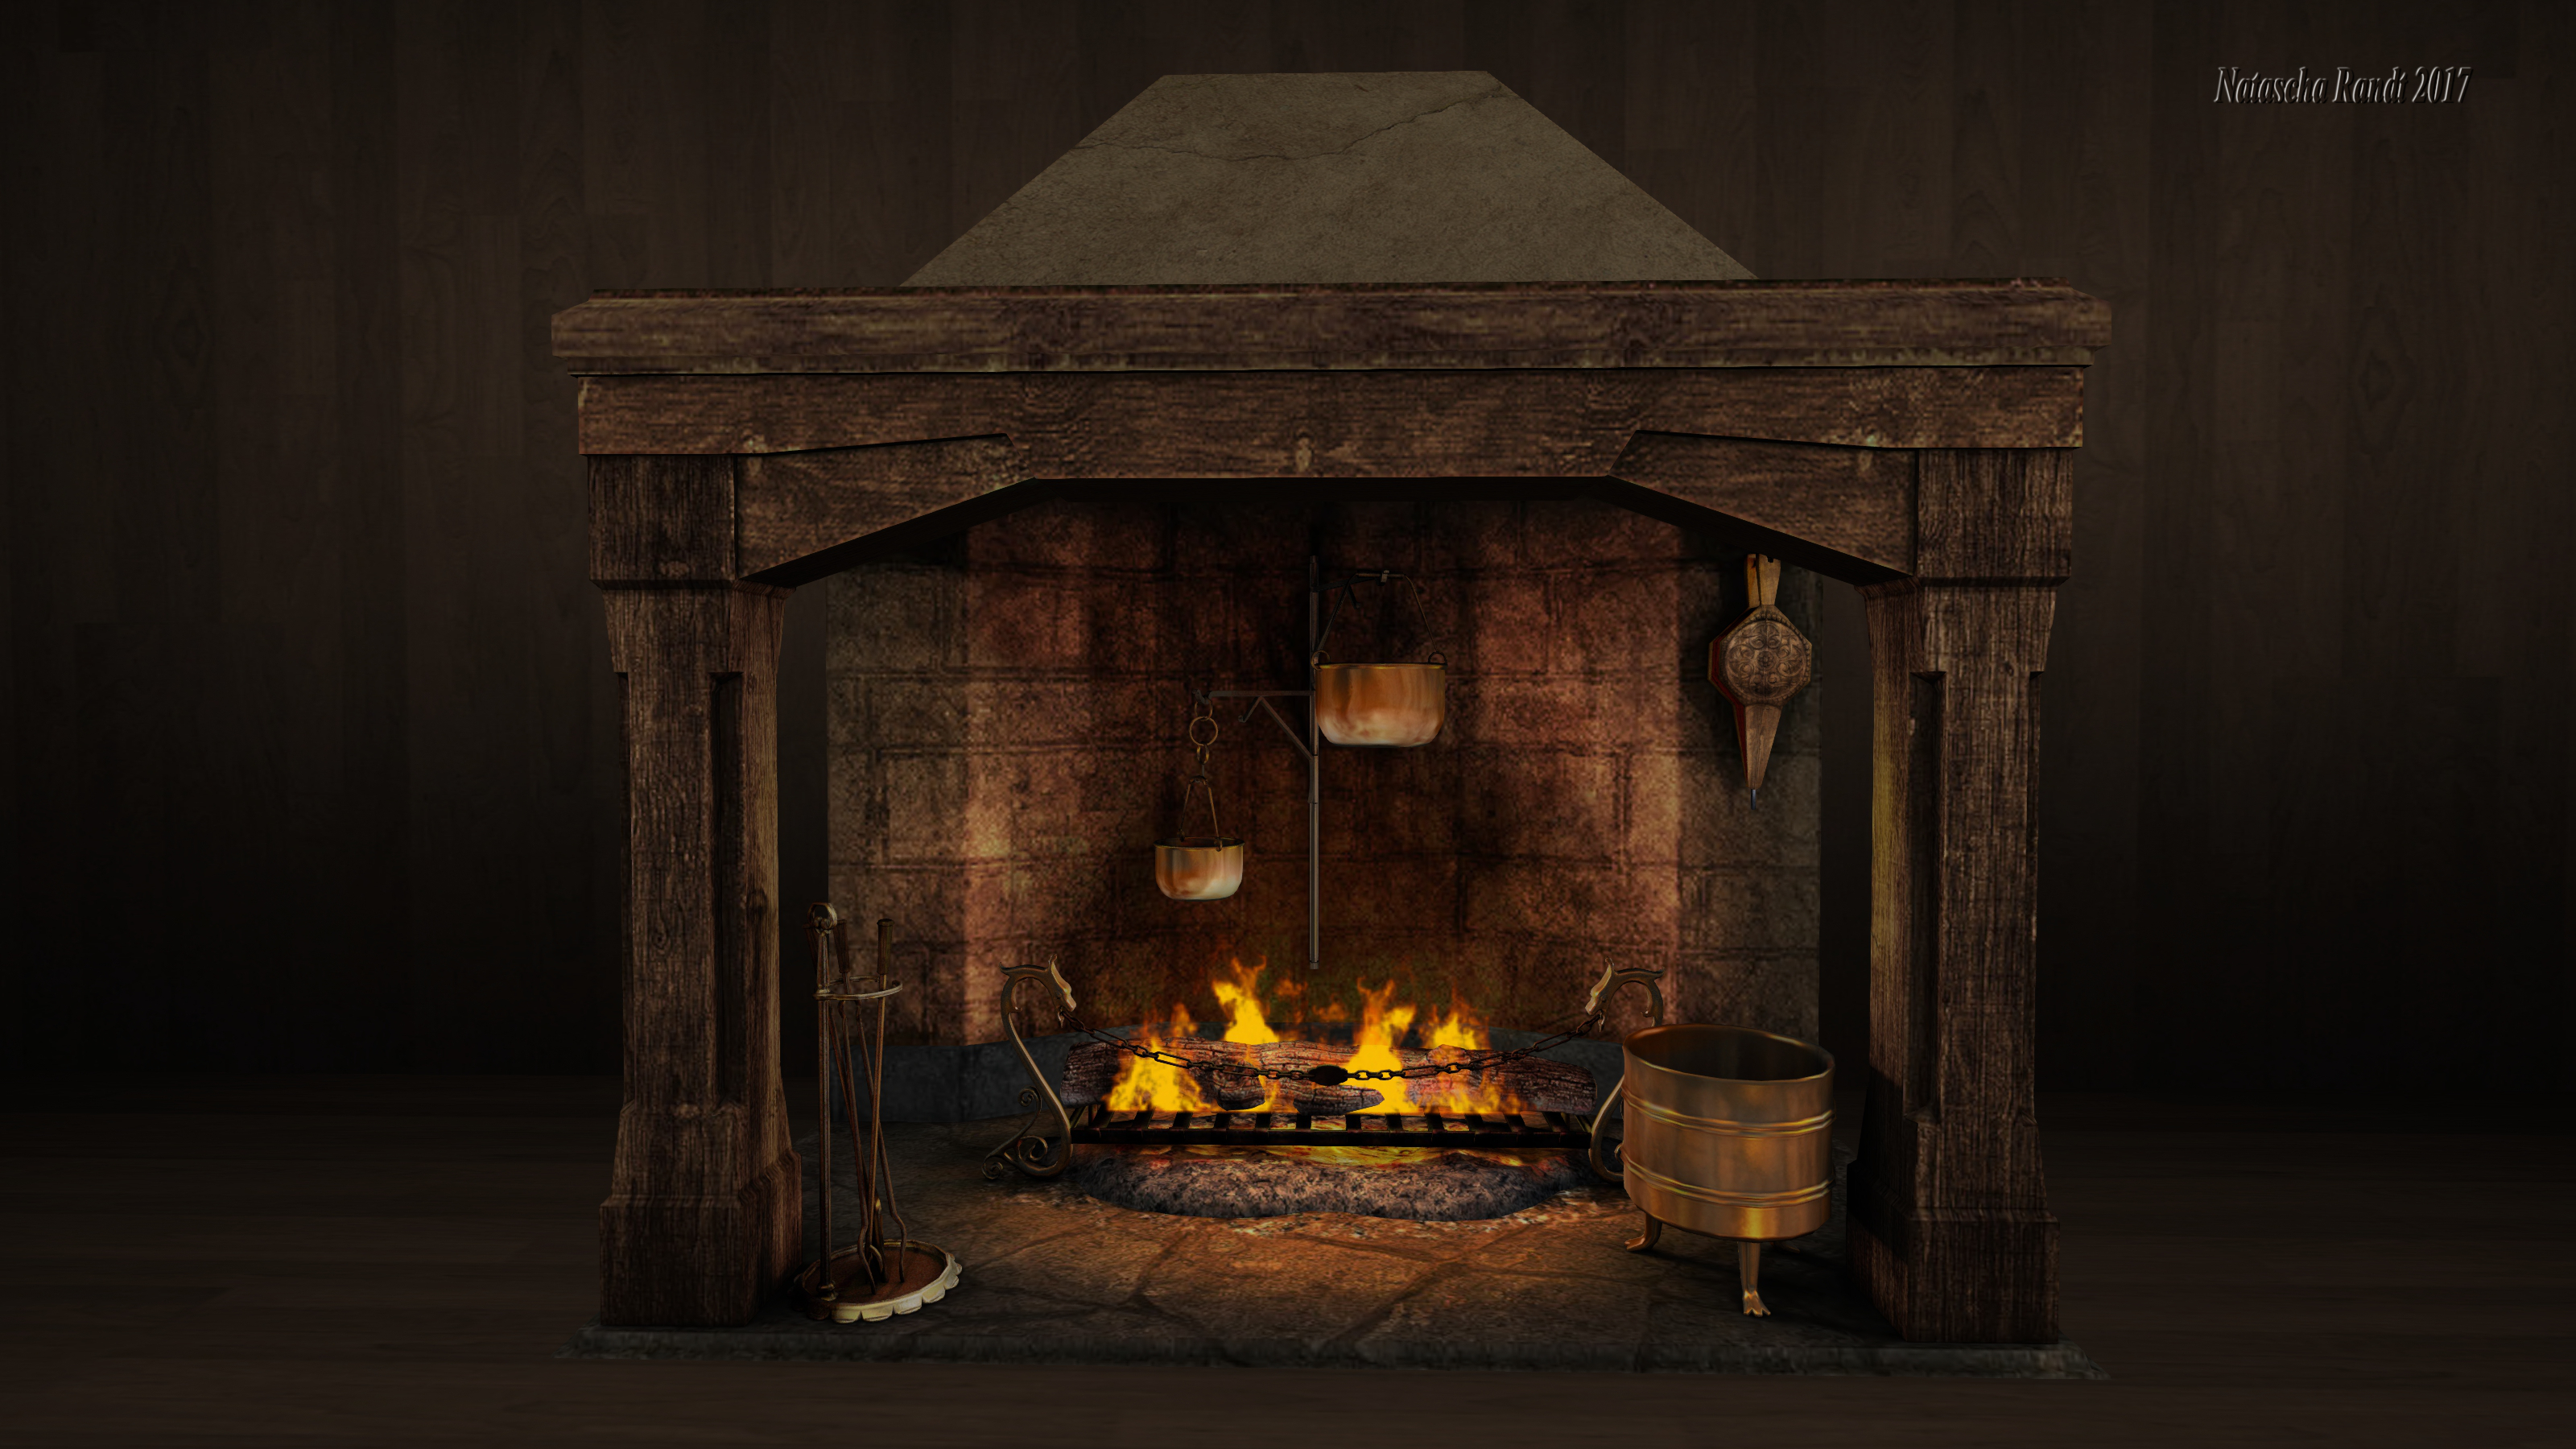 tante nat erkl rt die welt tonwertkorrektur mit gimp aetherisavidi. Black Bedroom Furniture Sets. Home Design Ideas